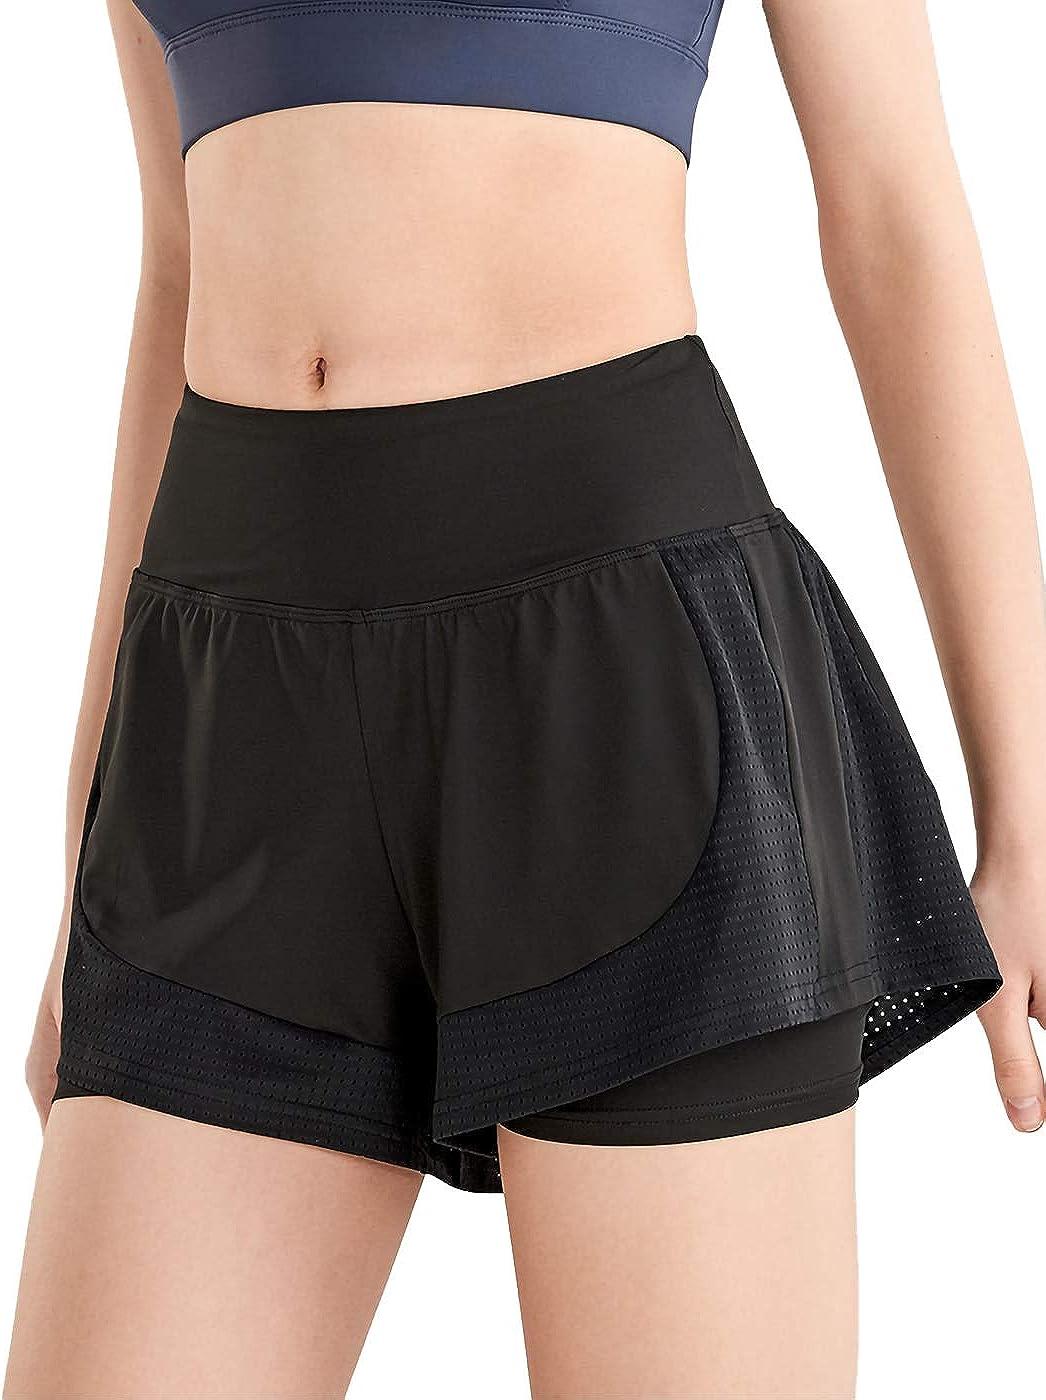 Anna-Kaci Womens Workout Athletic Running Shorts Active Yoga Gym Sport Shorts